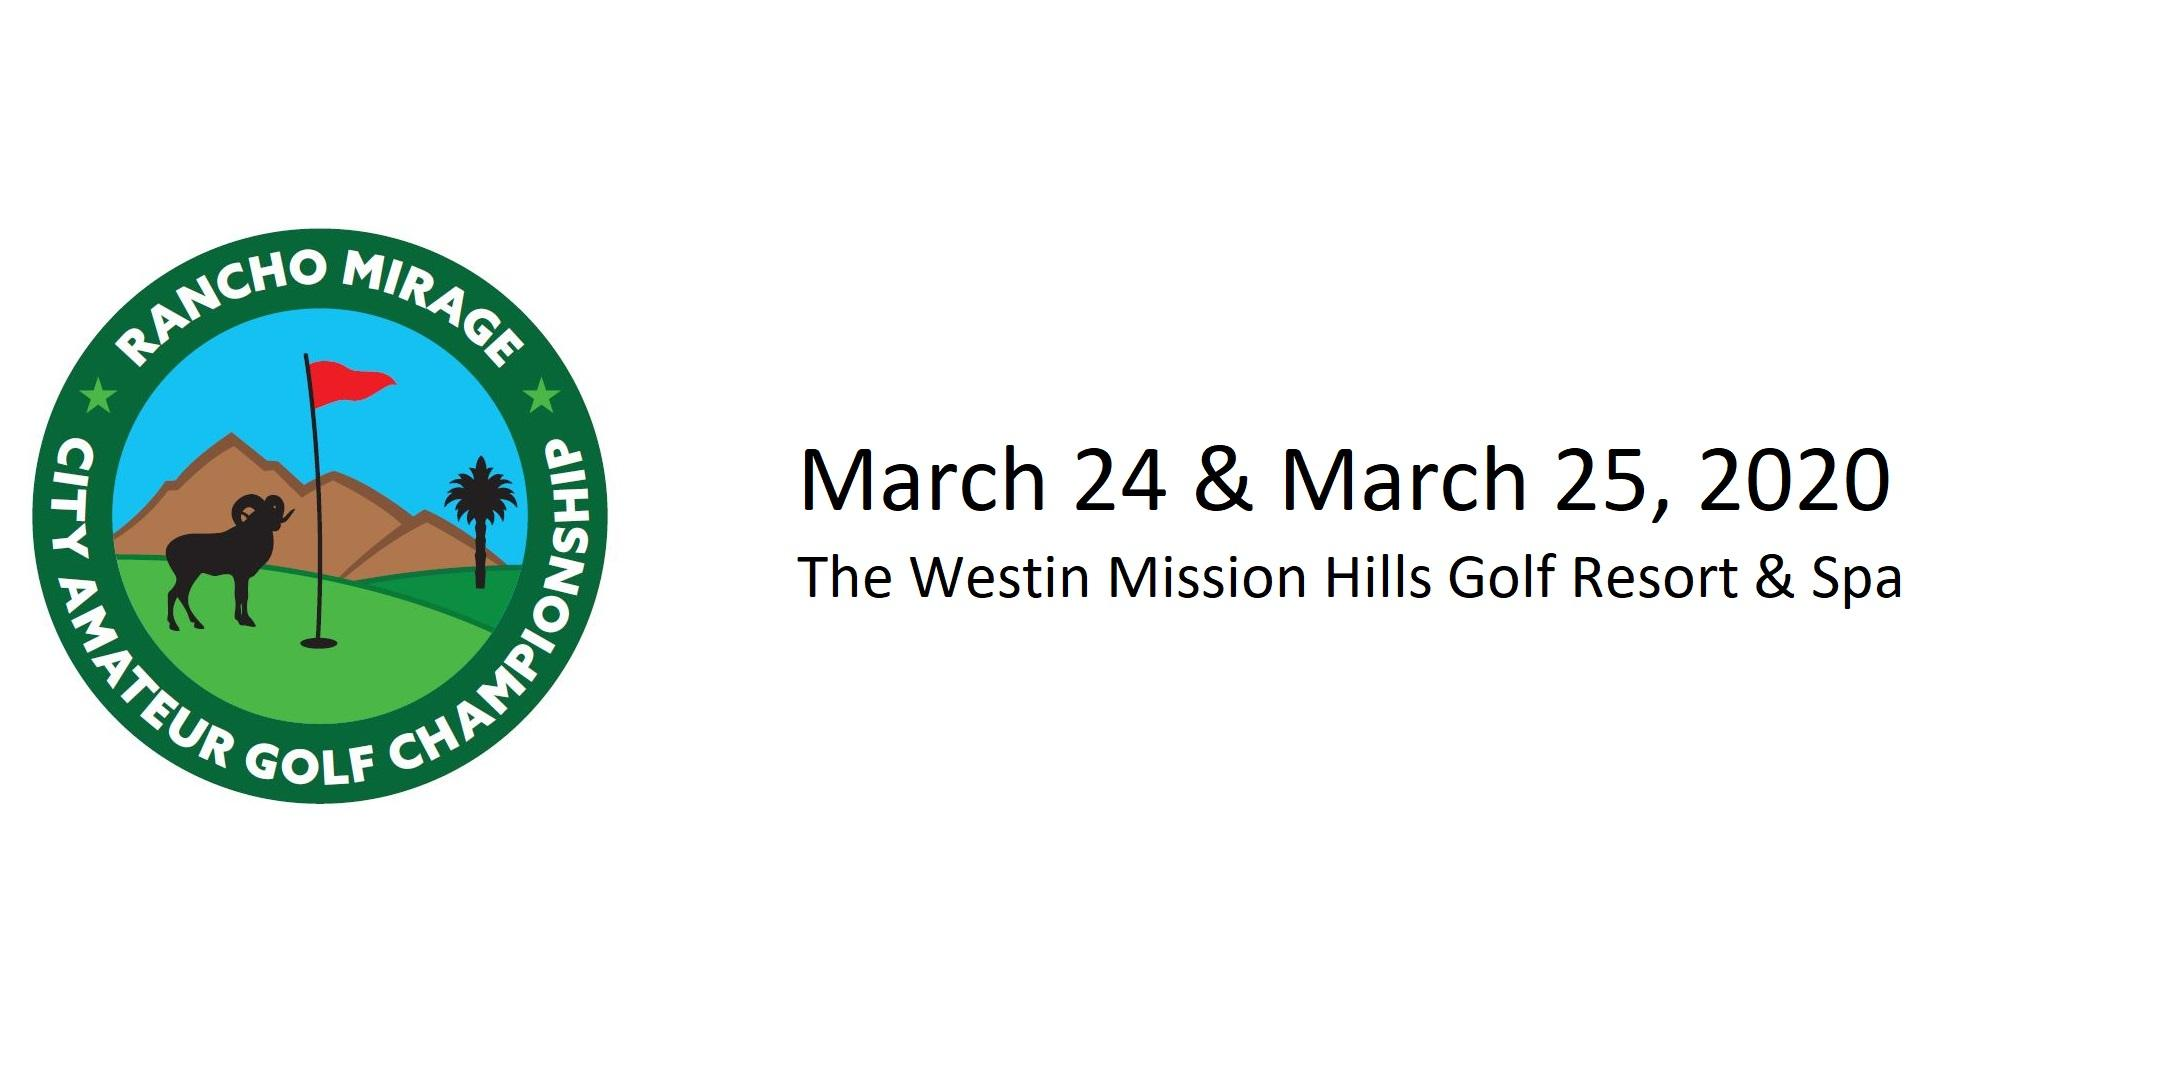 Rancho Mirage City Amateur Golf Championship